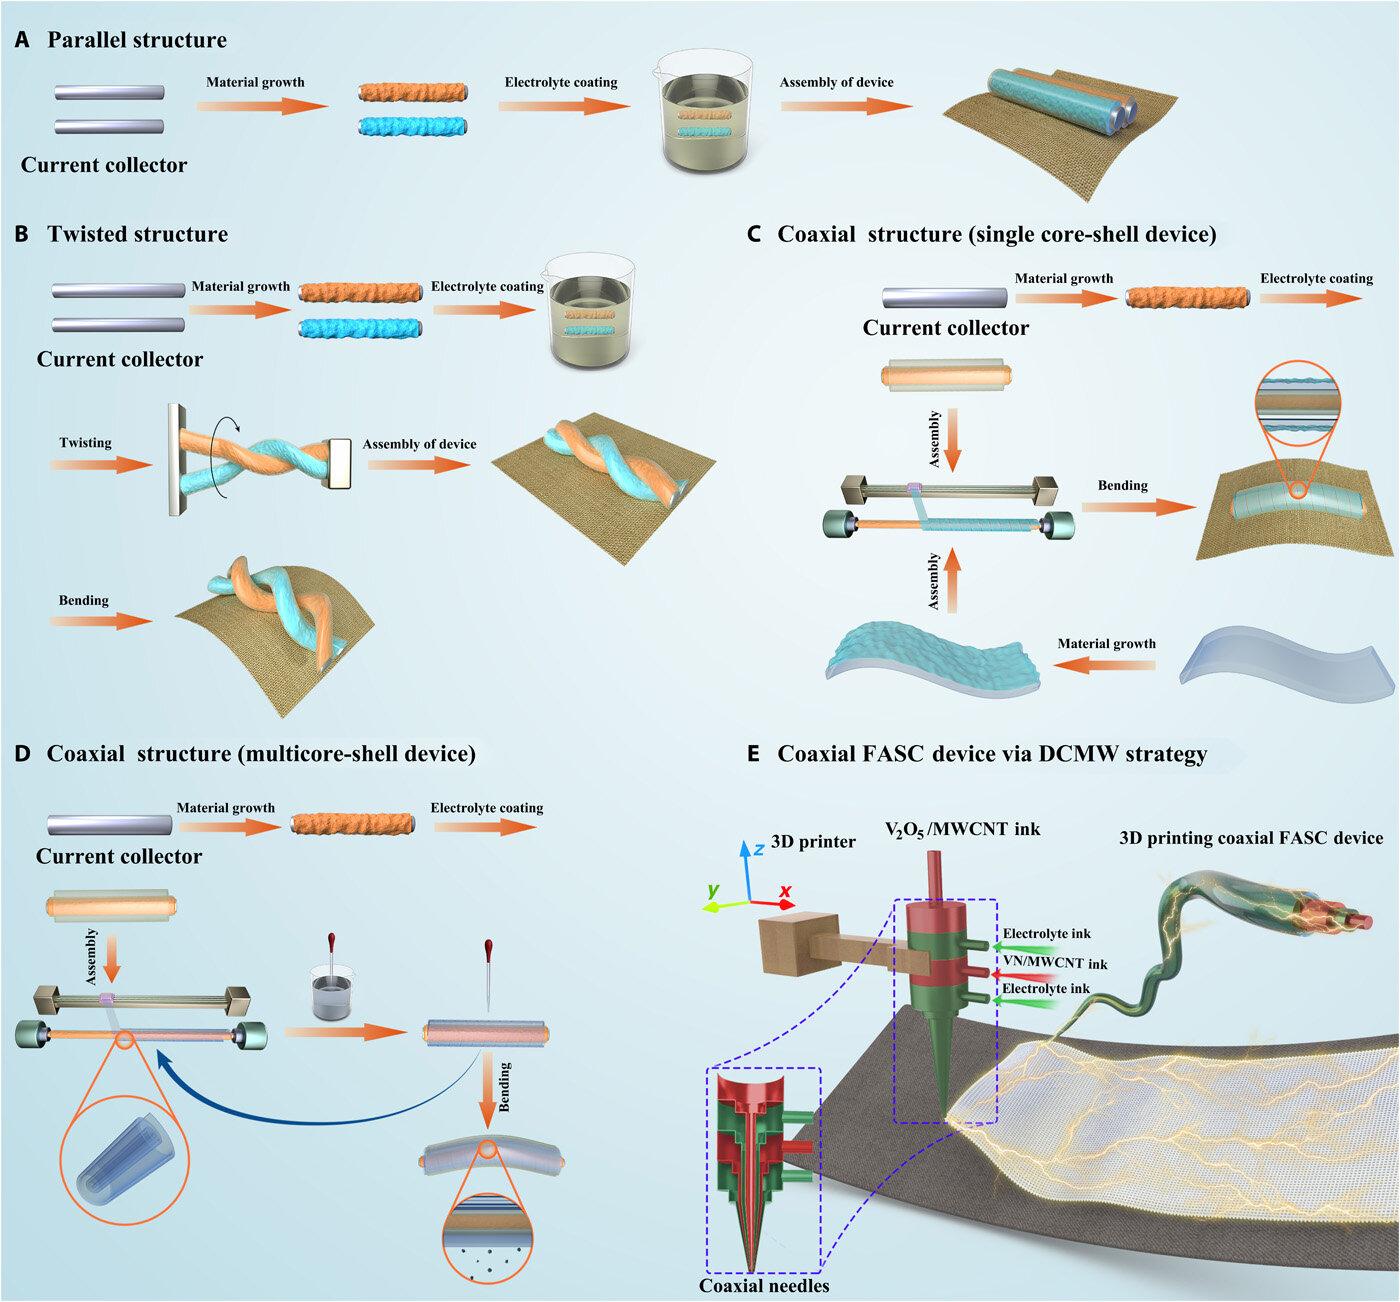 Direct coherent multi-ink printing of fabric supercapacitors